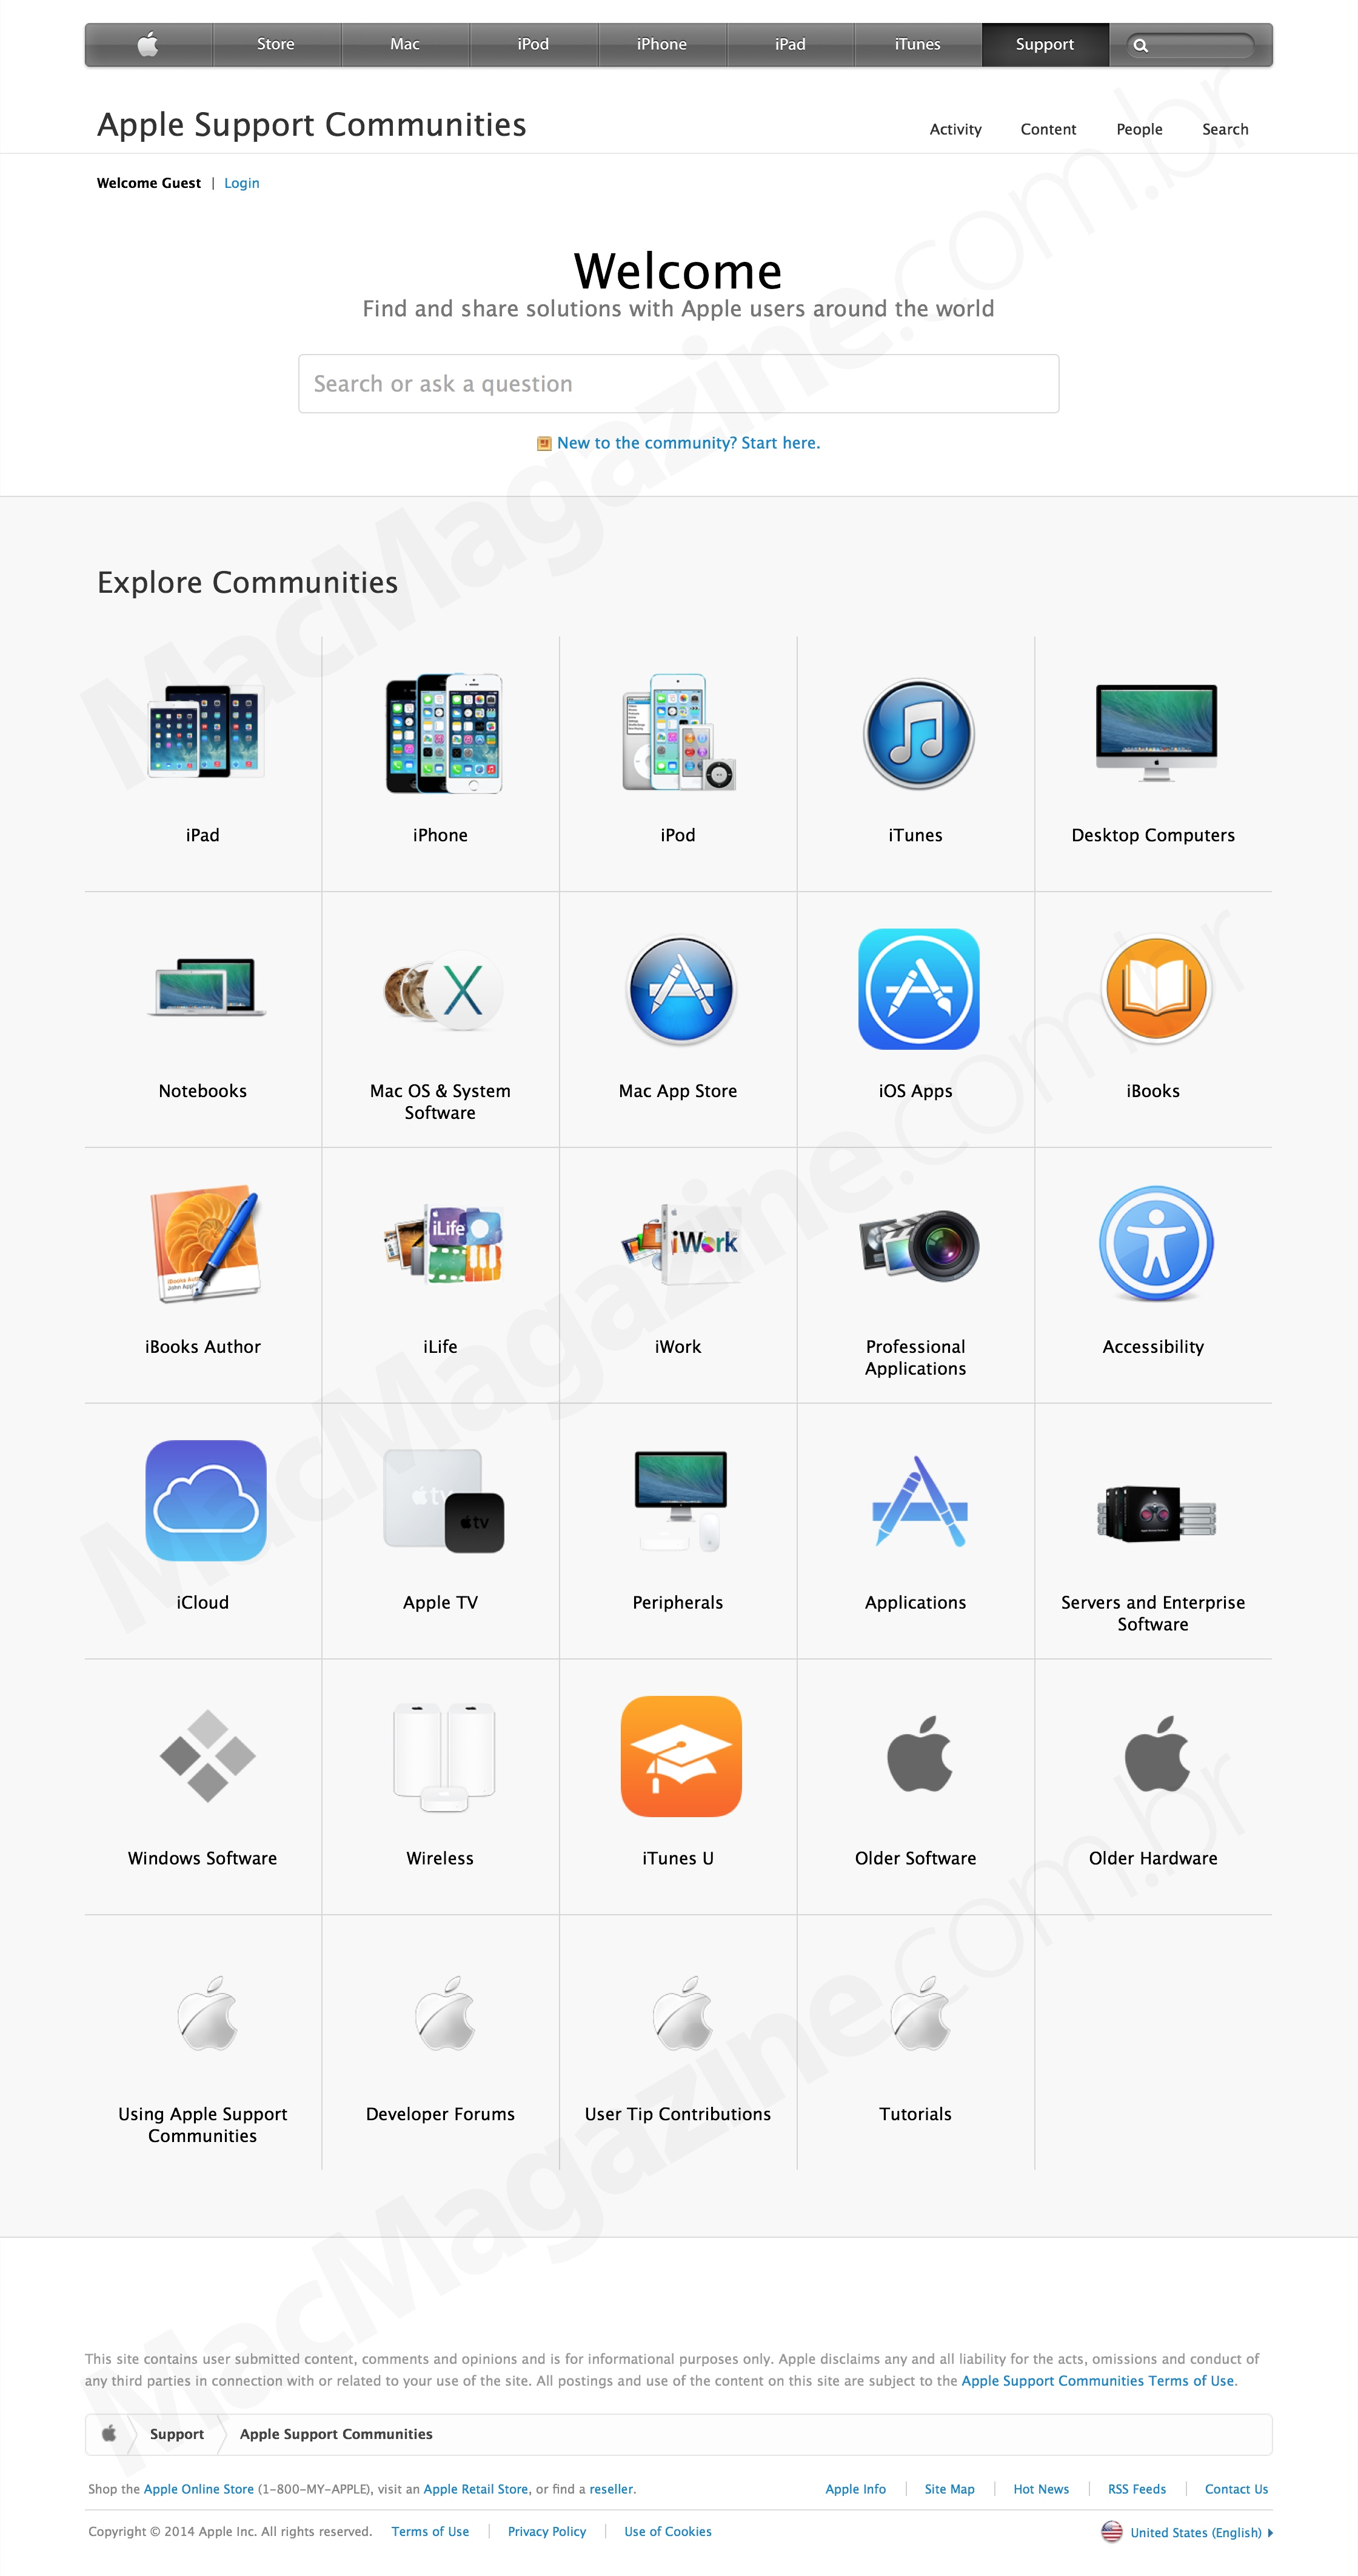 Novo Apple Support Communities